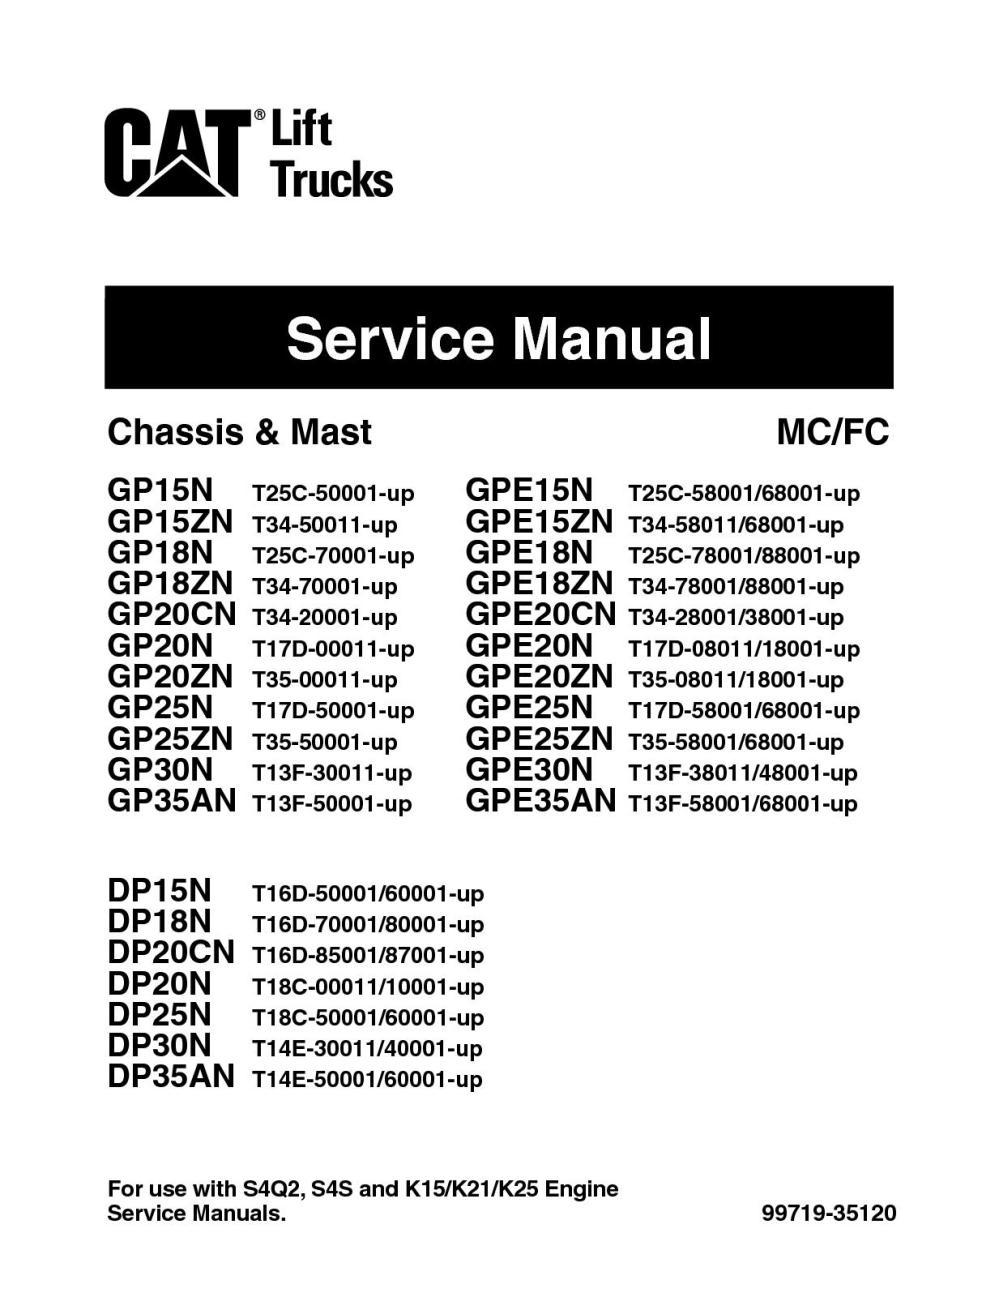 medium resolution of caterpillar cat gp35n forklift lift trucks service repair manual snt13f 50001 and up